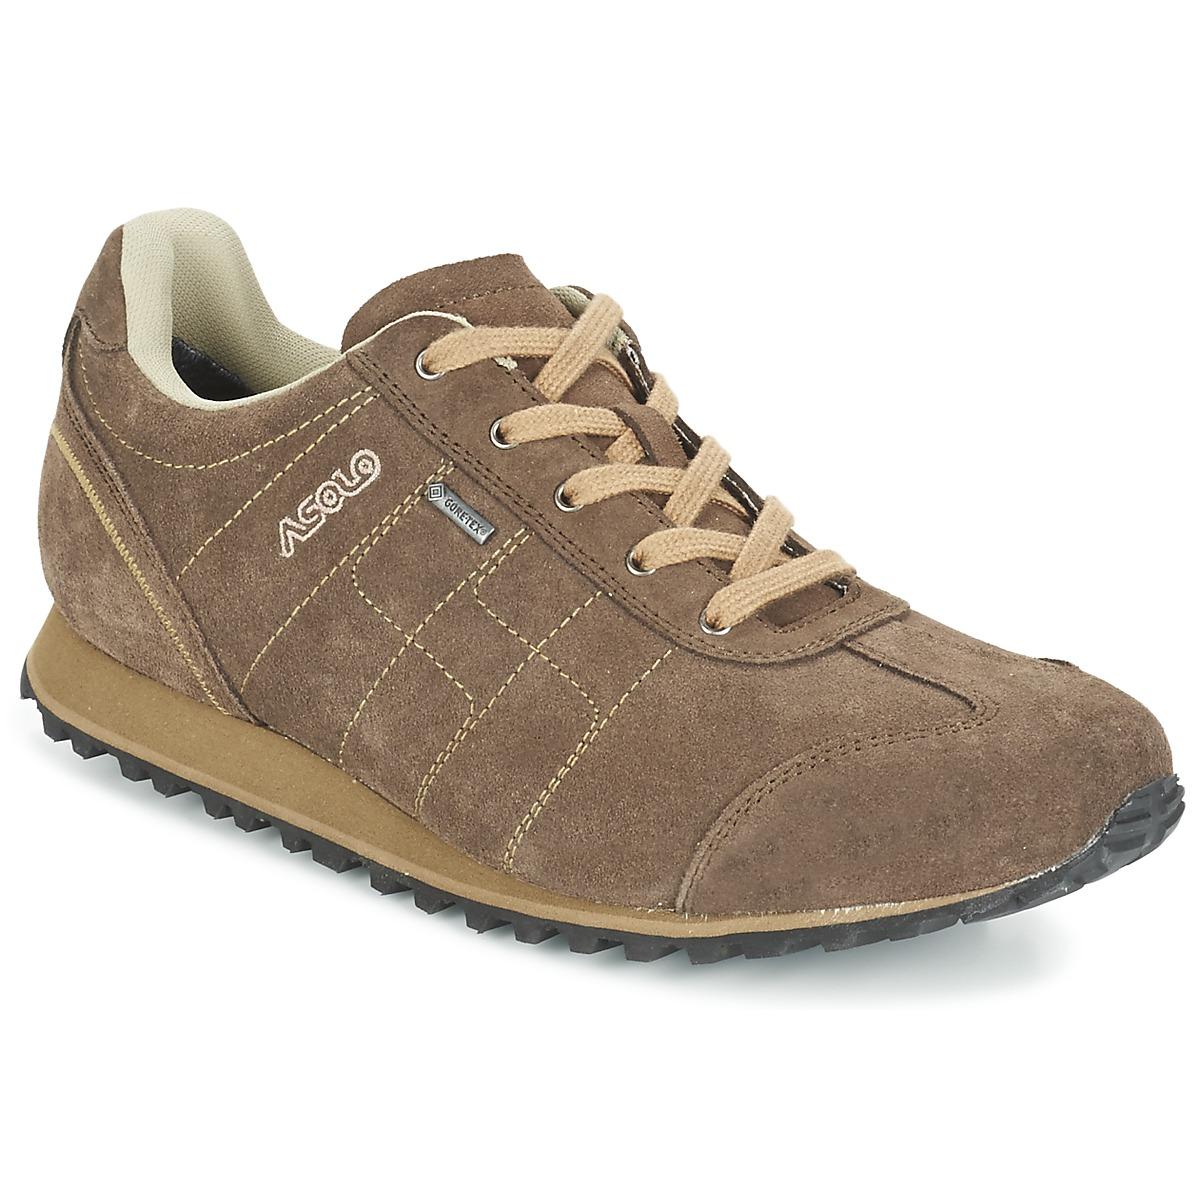 Chaussures-de-randonnee Asolo QUINCE GV MM Marron